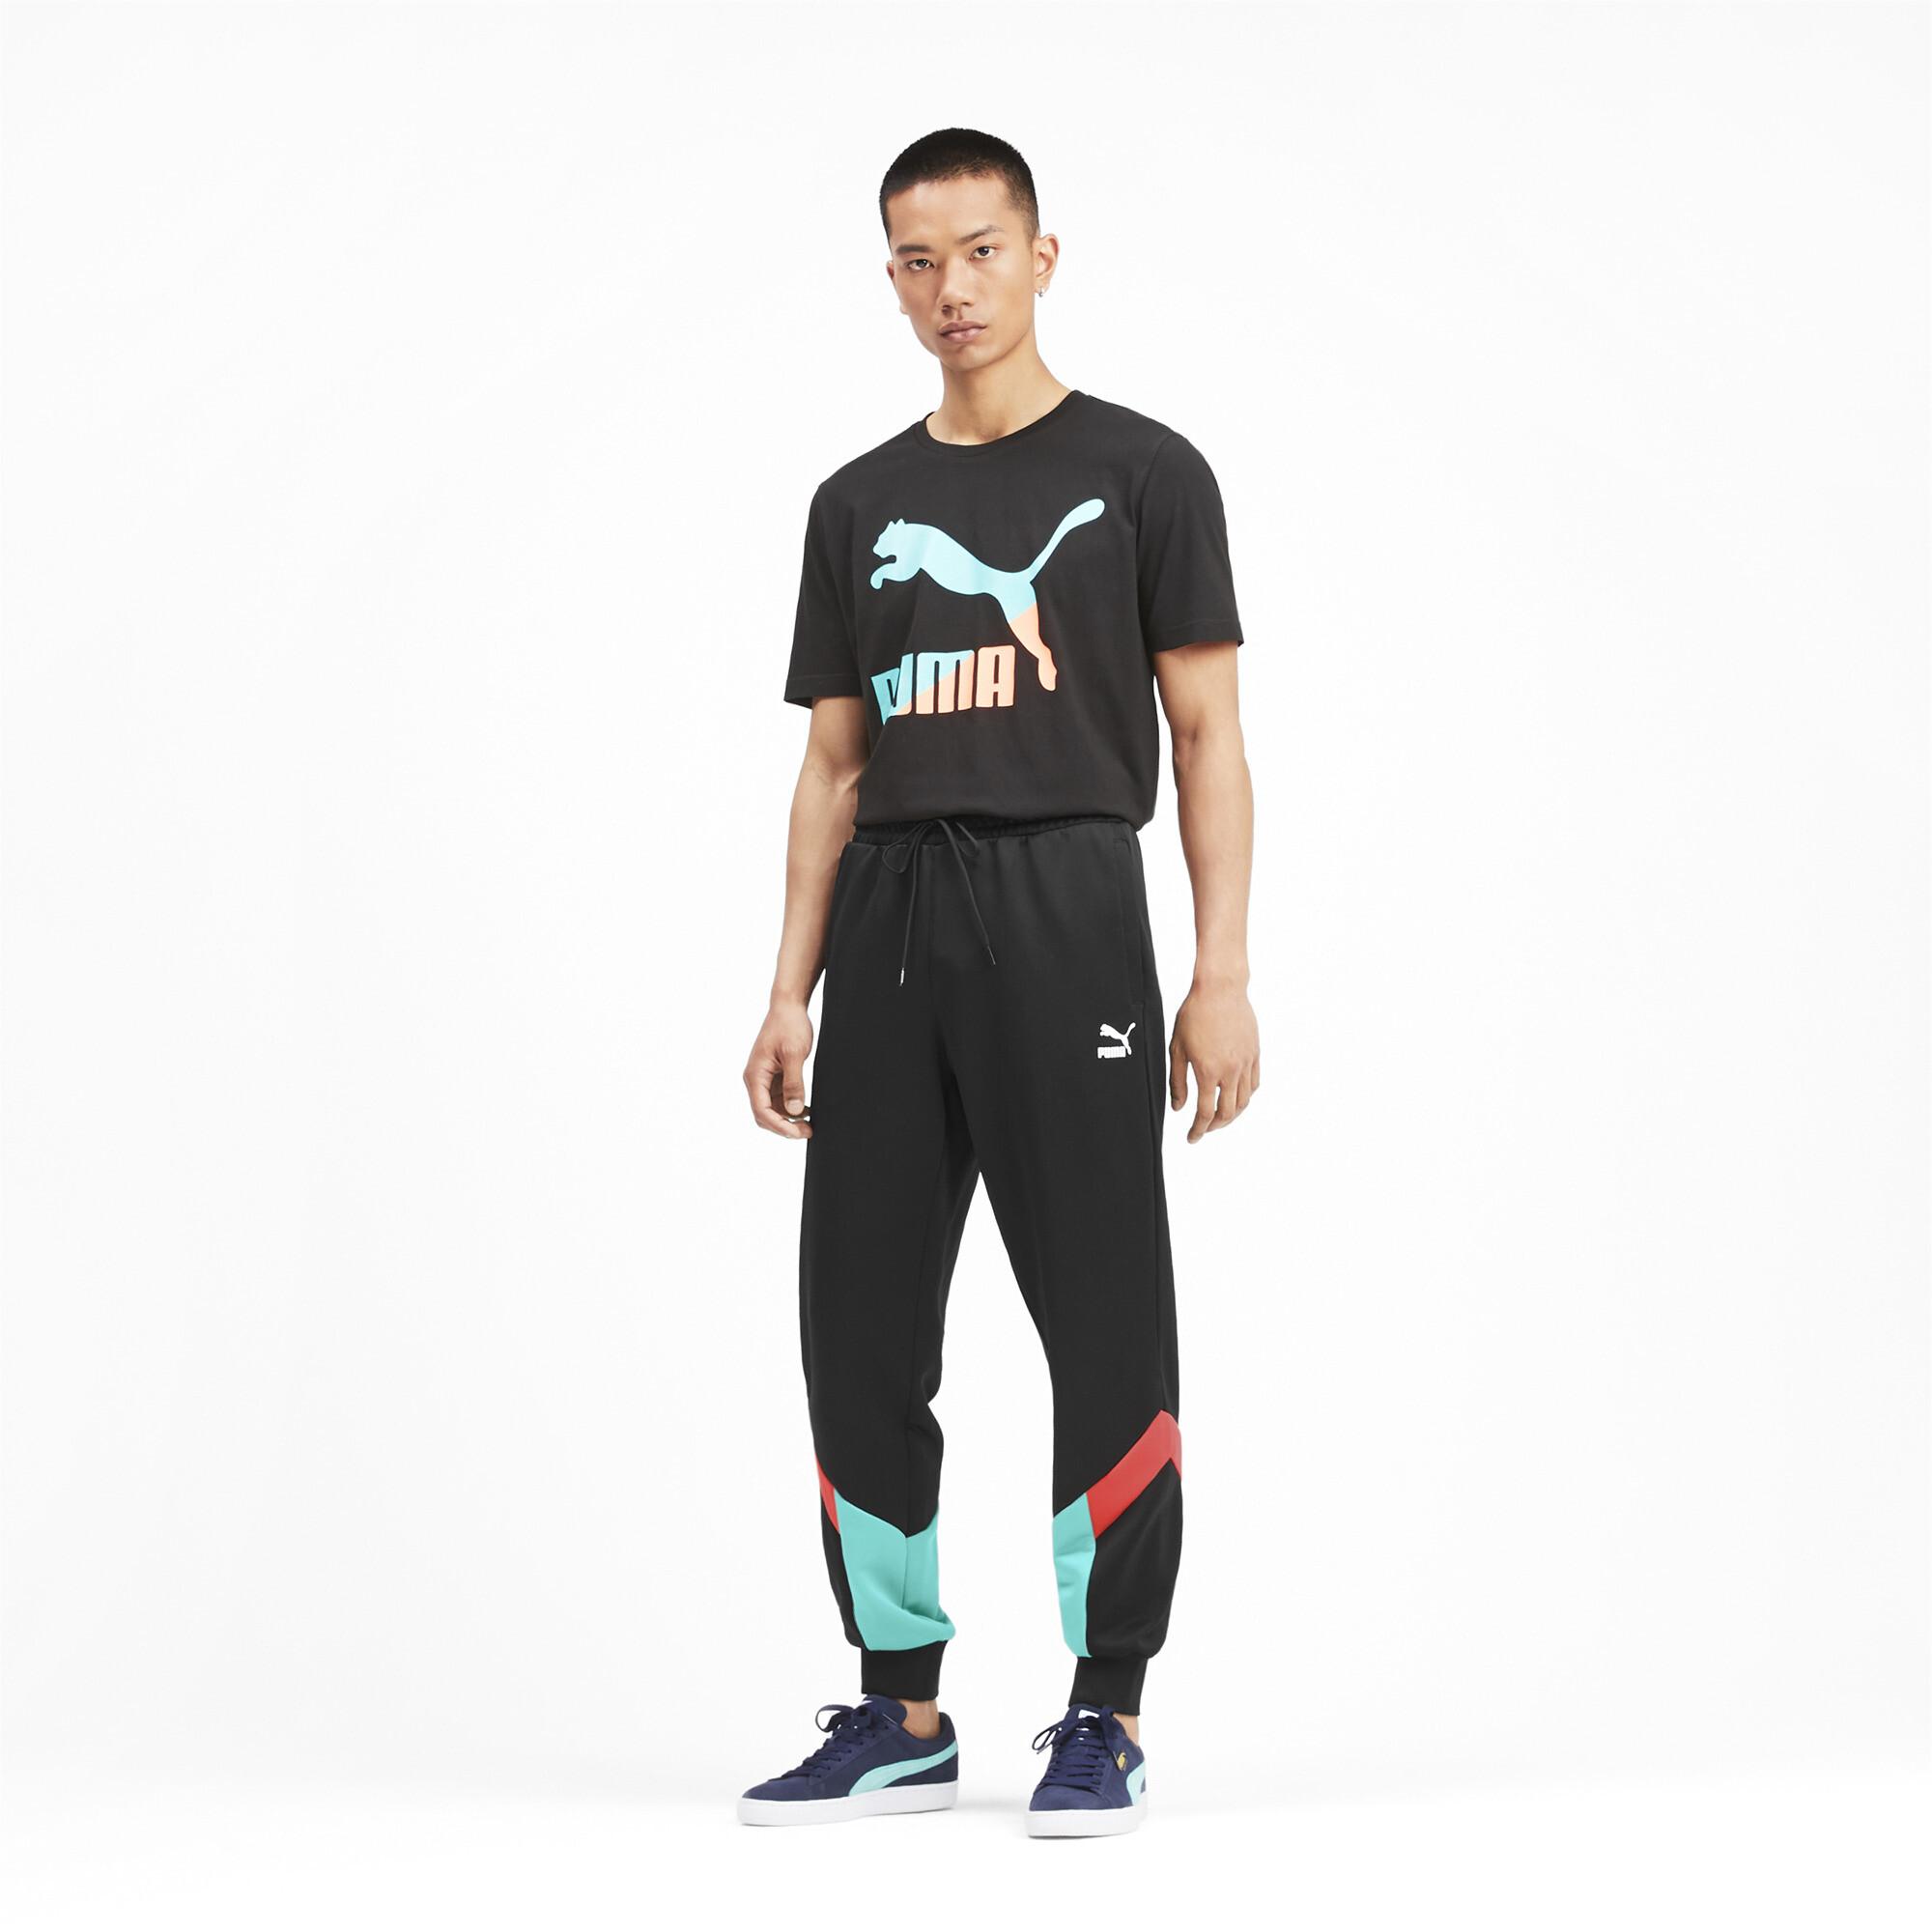 PUMA-Iconic-MCS-Men-039-s-Track-Pants-Men-Knitted-Pants-Sport-Classics thumbnail 17